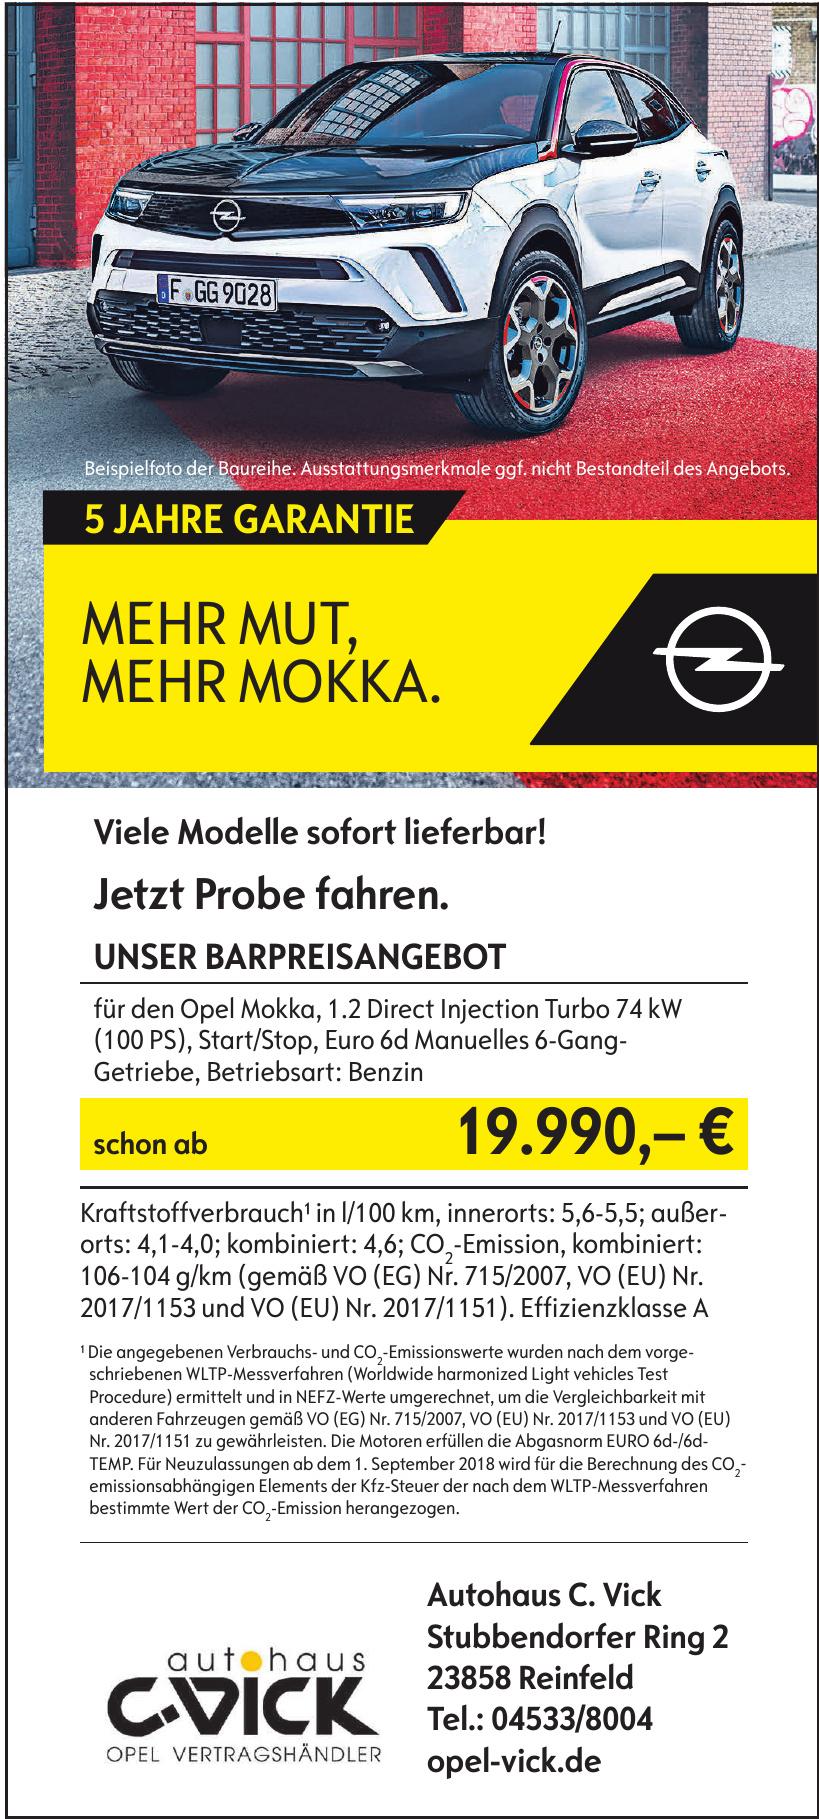 Autohaus C. Vick GmbH